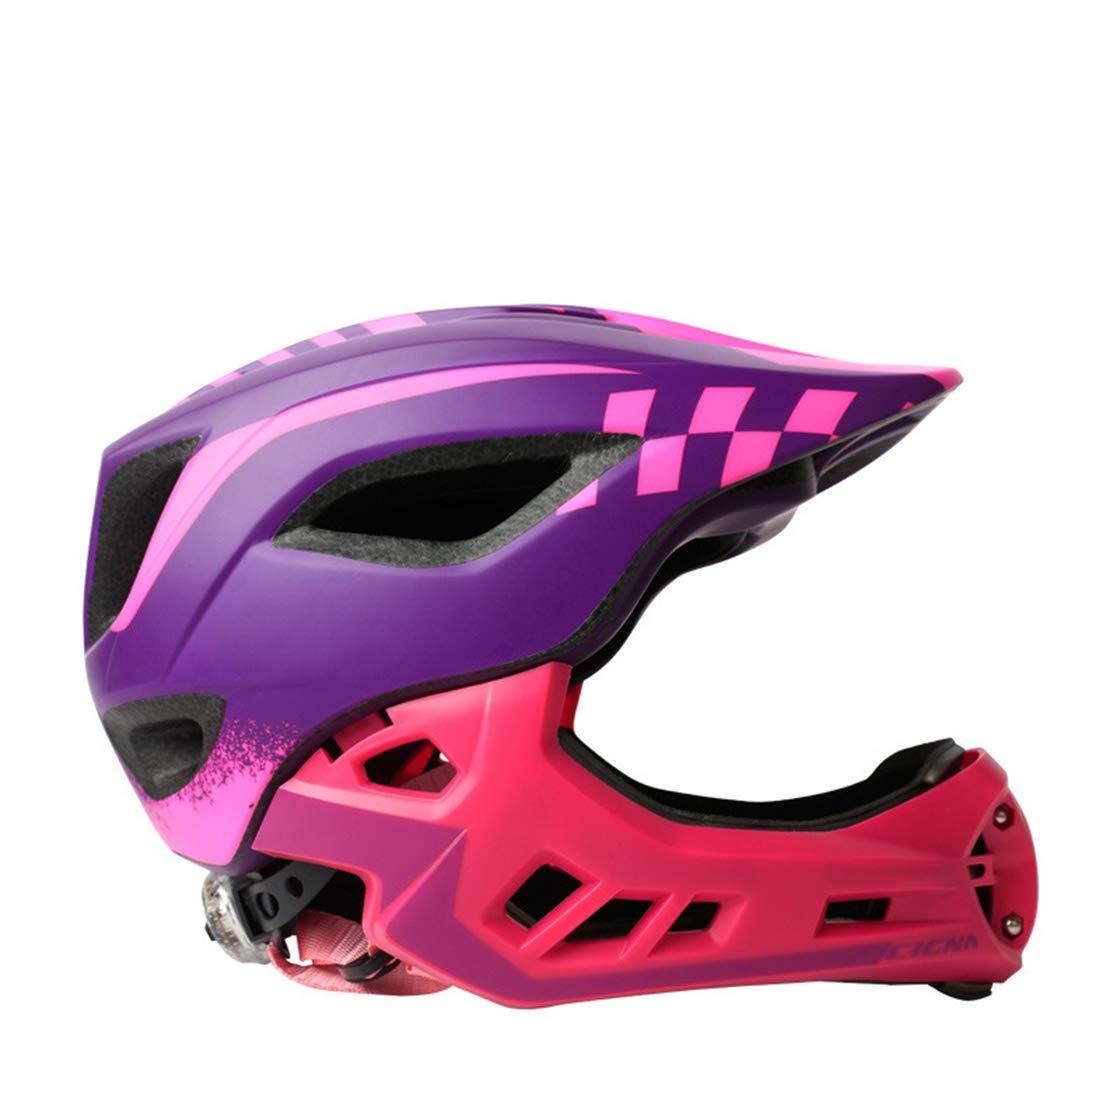 Ysayc Abnehmbar Fahrrad Skateboard Kind Helm Draussen Bunt Leicht Multifunktion Autobahn Radfahren Motorrad Schutz Visor Deluxe Helm, lila, M